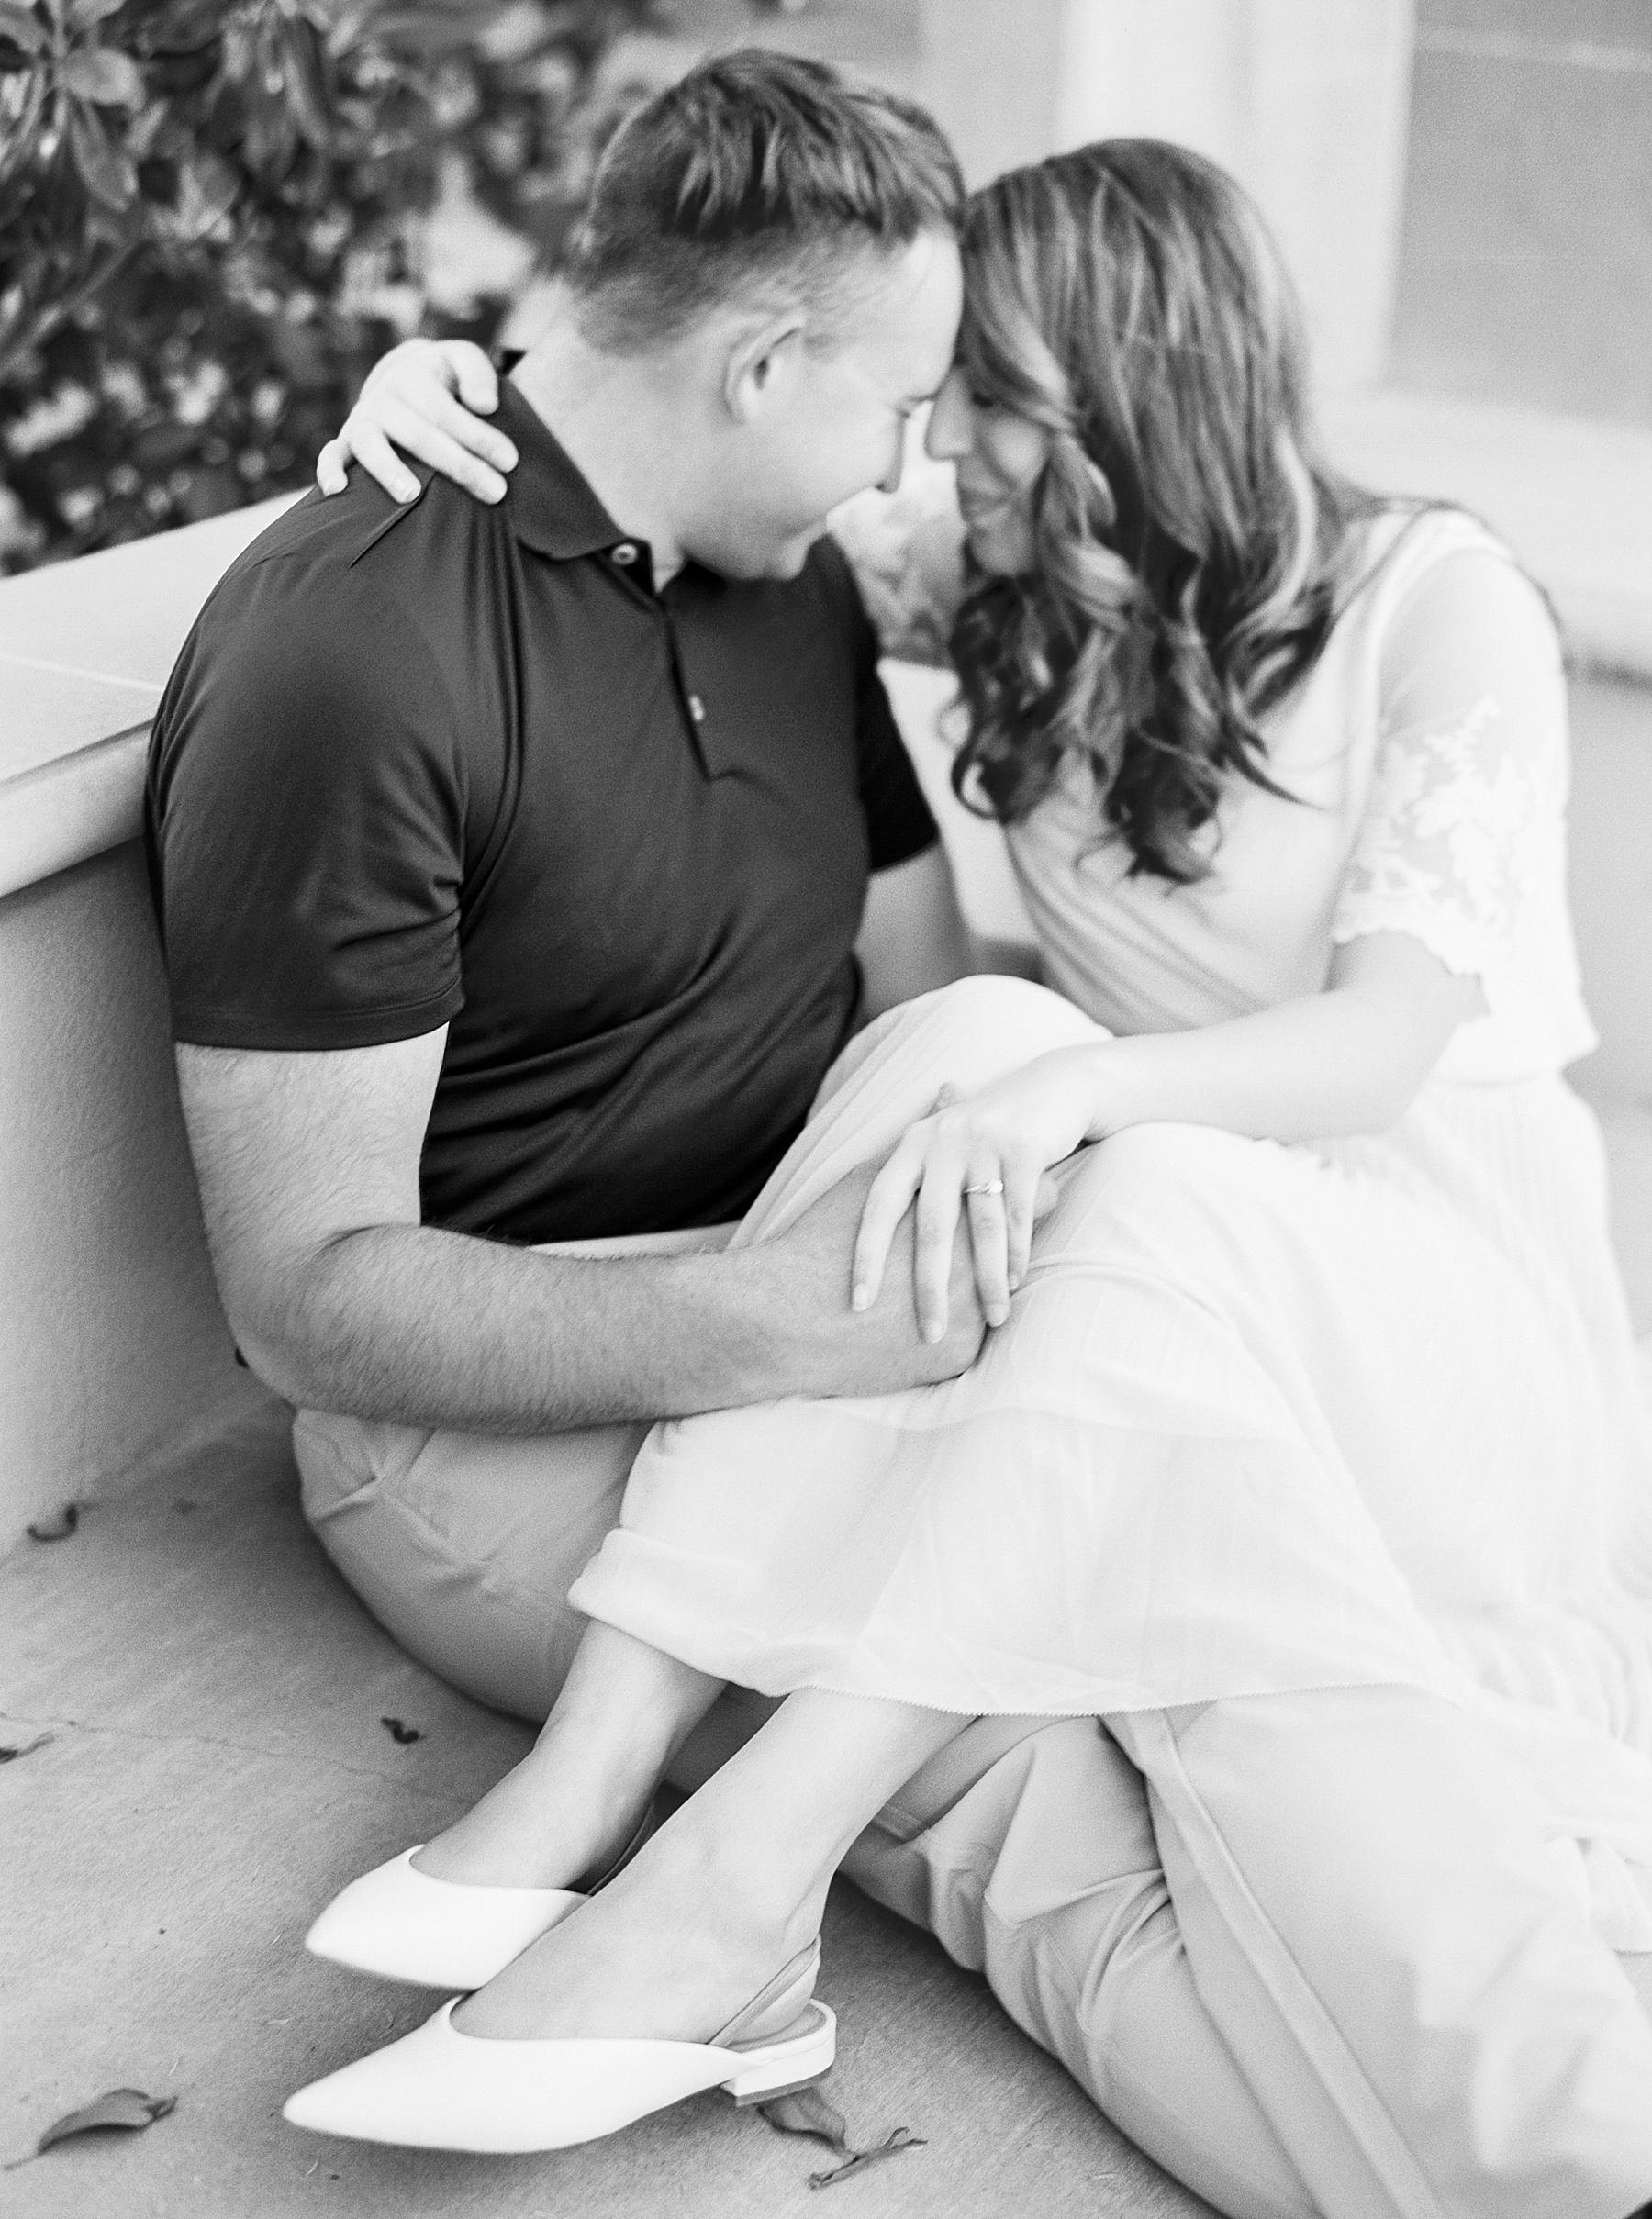 Scribner Bend Winery Engagement Session - Courtney and Steven - Ashley Baumgartner - Sribner Bend Wedding Photographer - Sacramento Wedding Photographer_0017.jpg